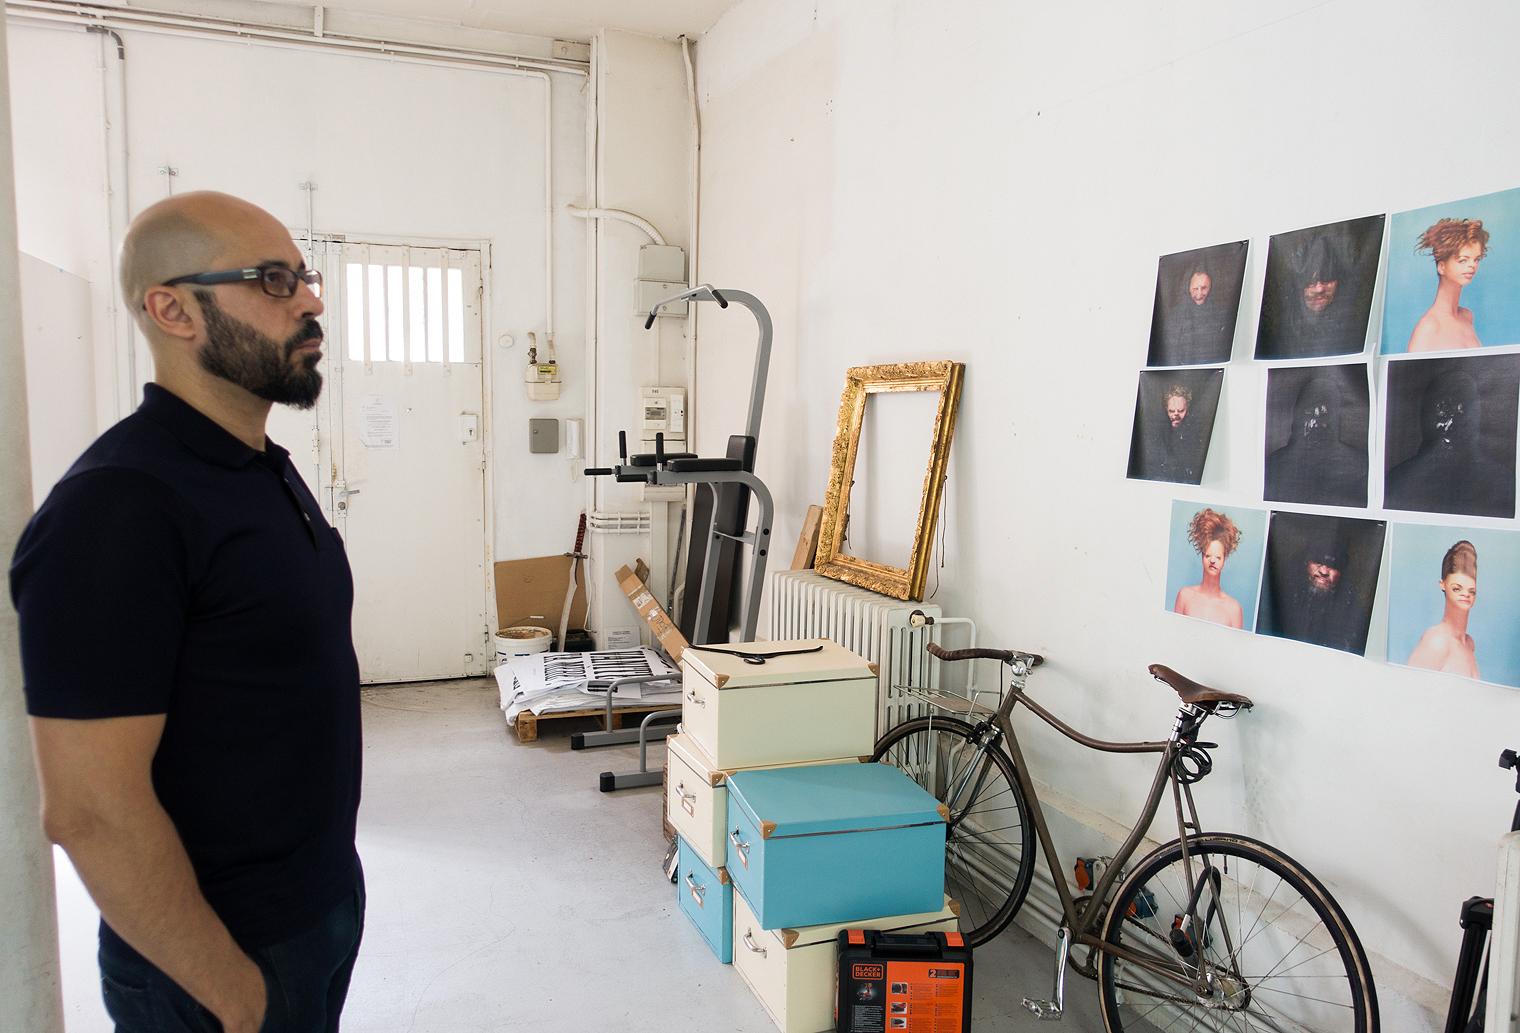 Wahib gazing deeply into his work.